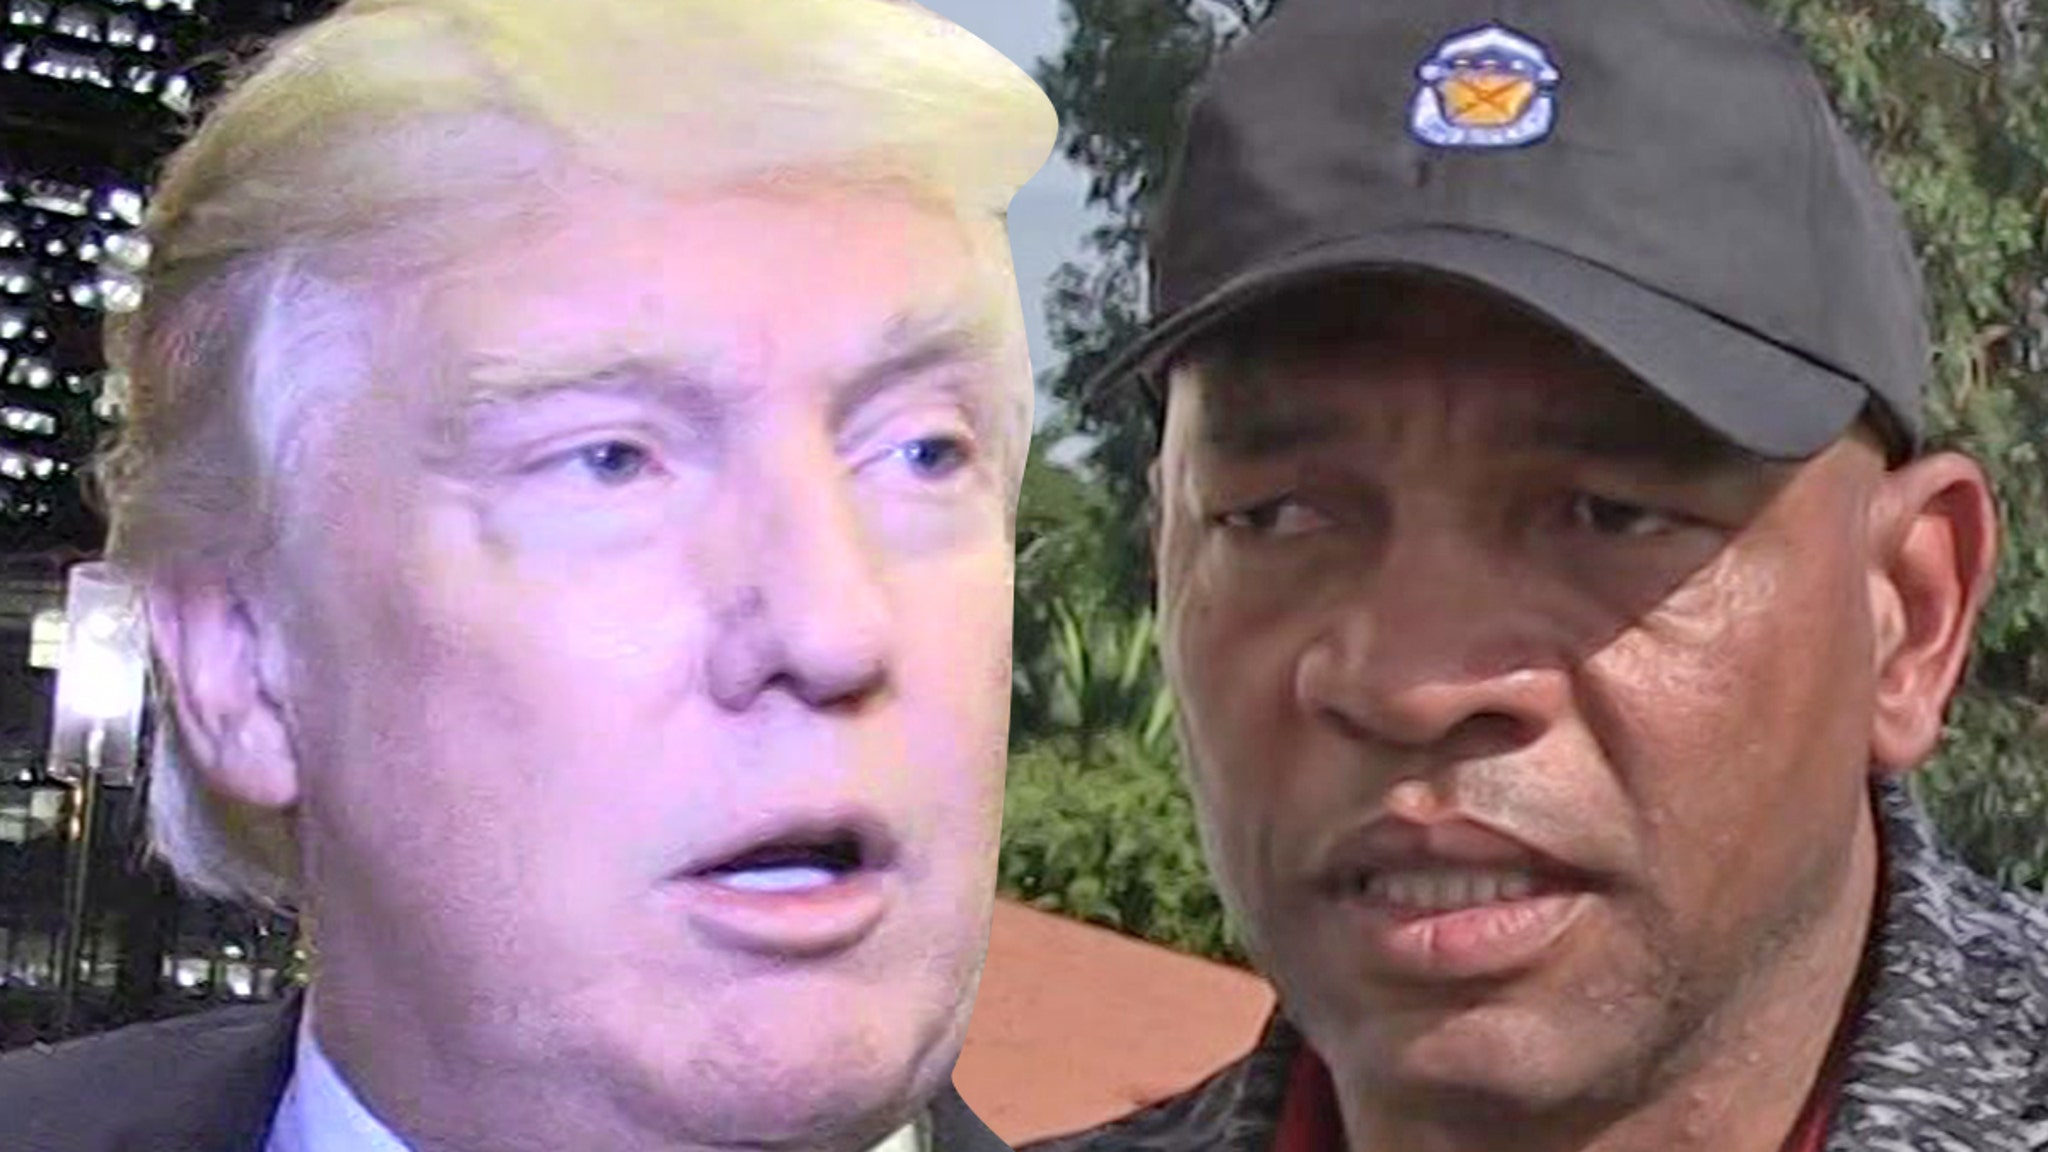 President Trump Rips 'Disgraceful' NBA Kneelers, Doc Rivers Fires Back